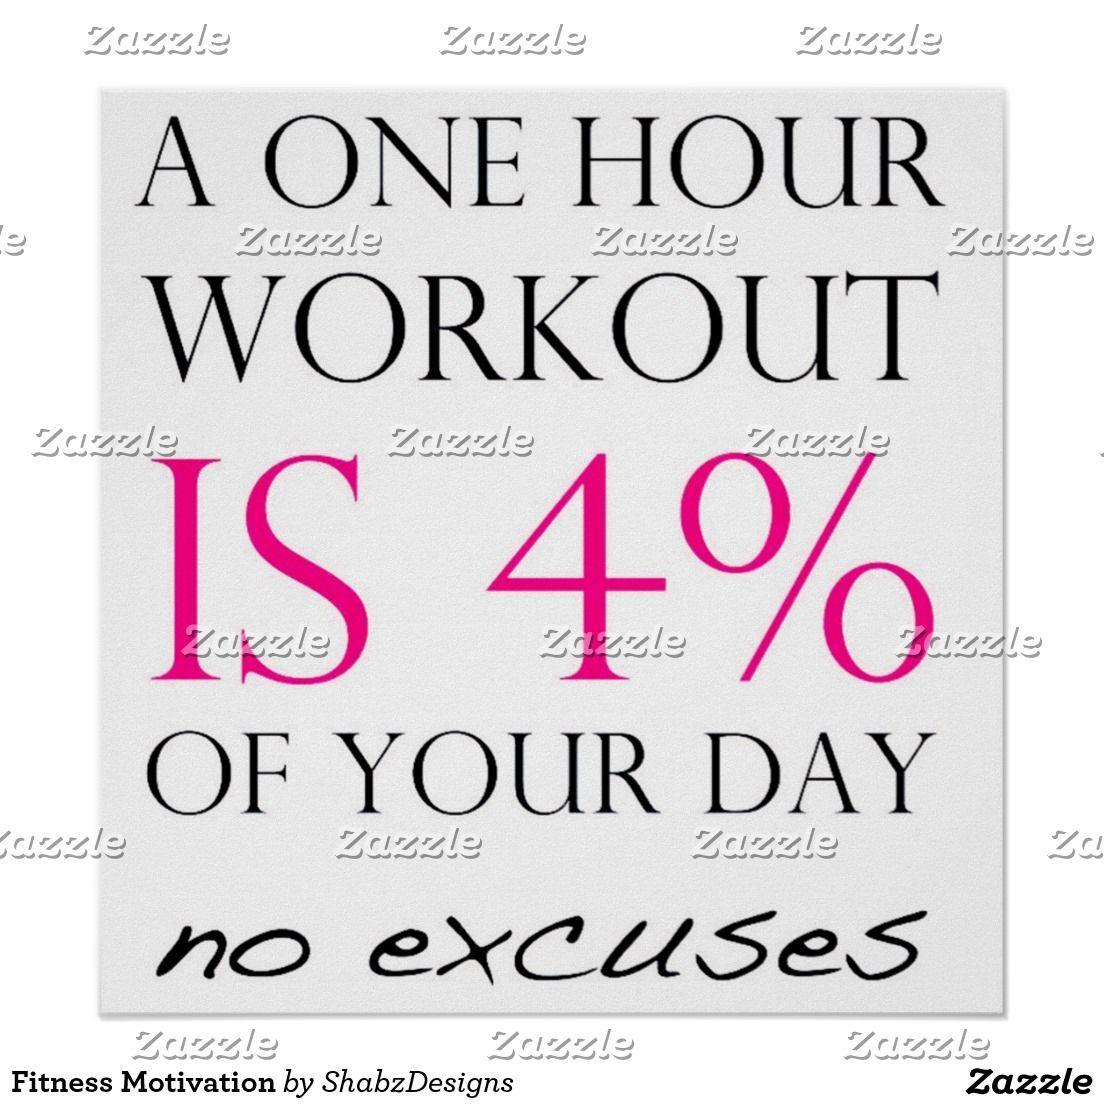 Fitness Motivation #fitness #health #exercise #motivation #workoutmotivation #motivationalposter